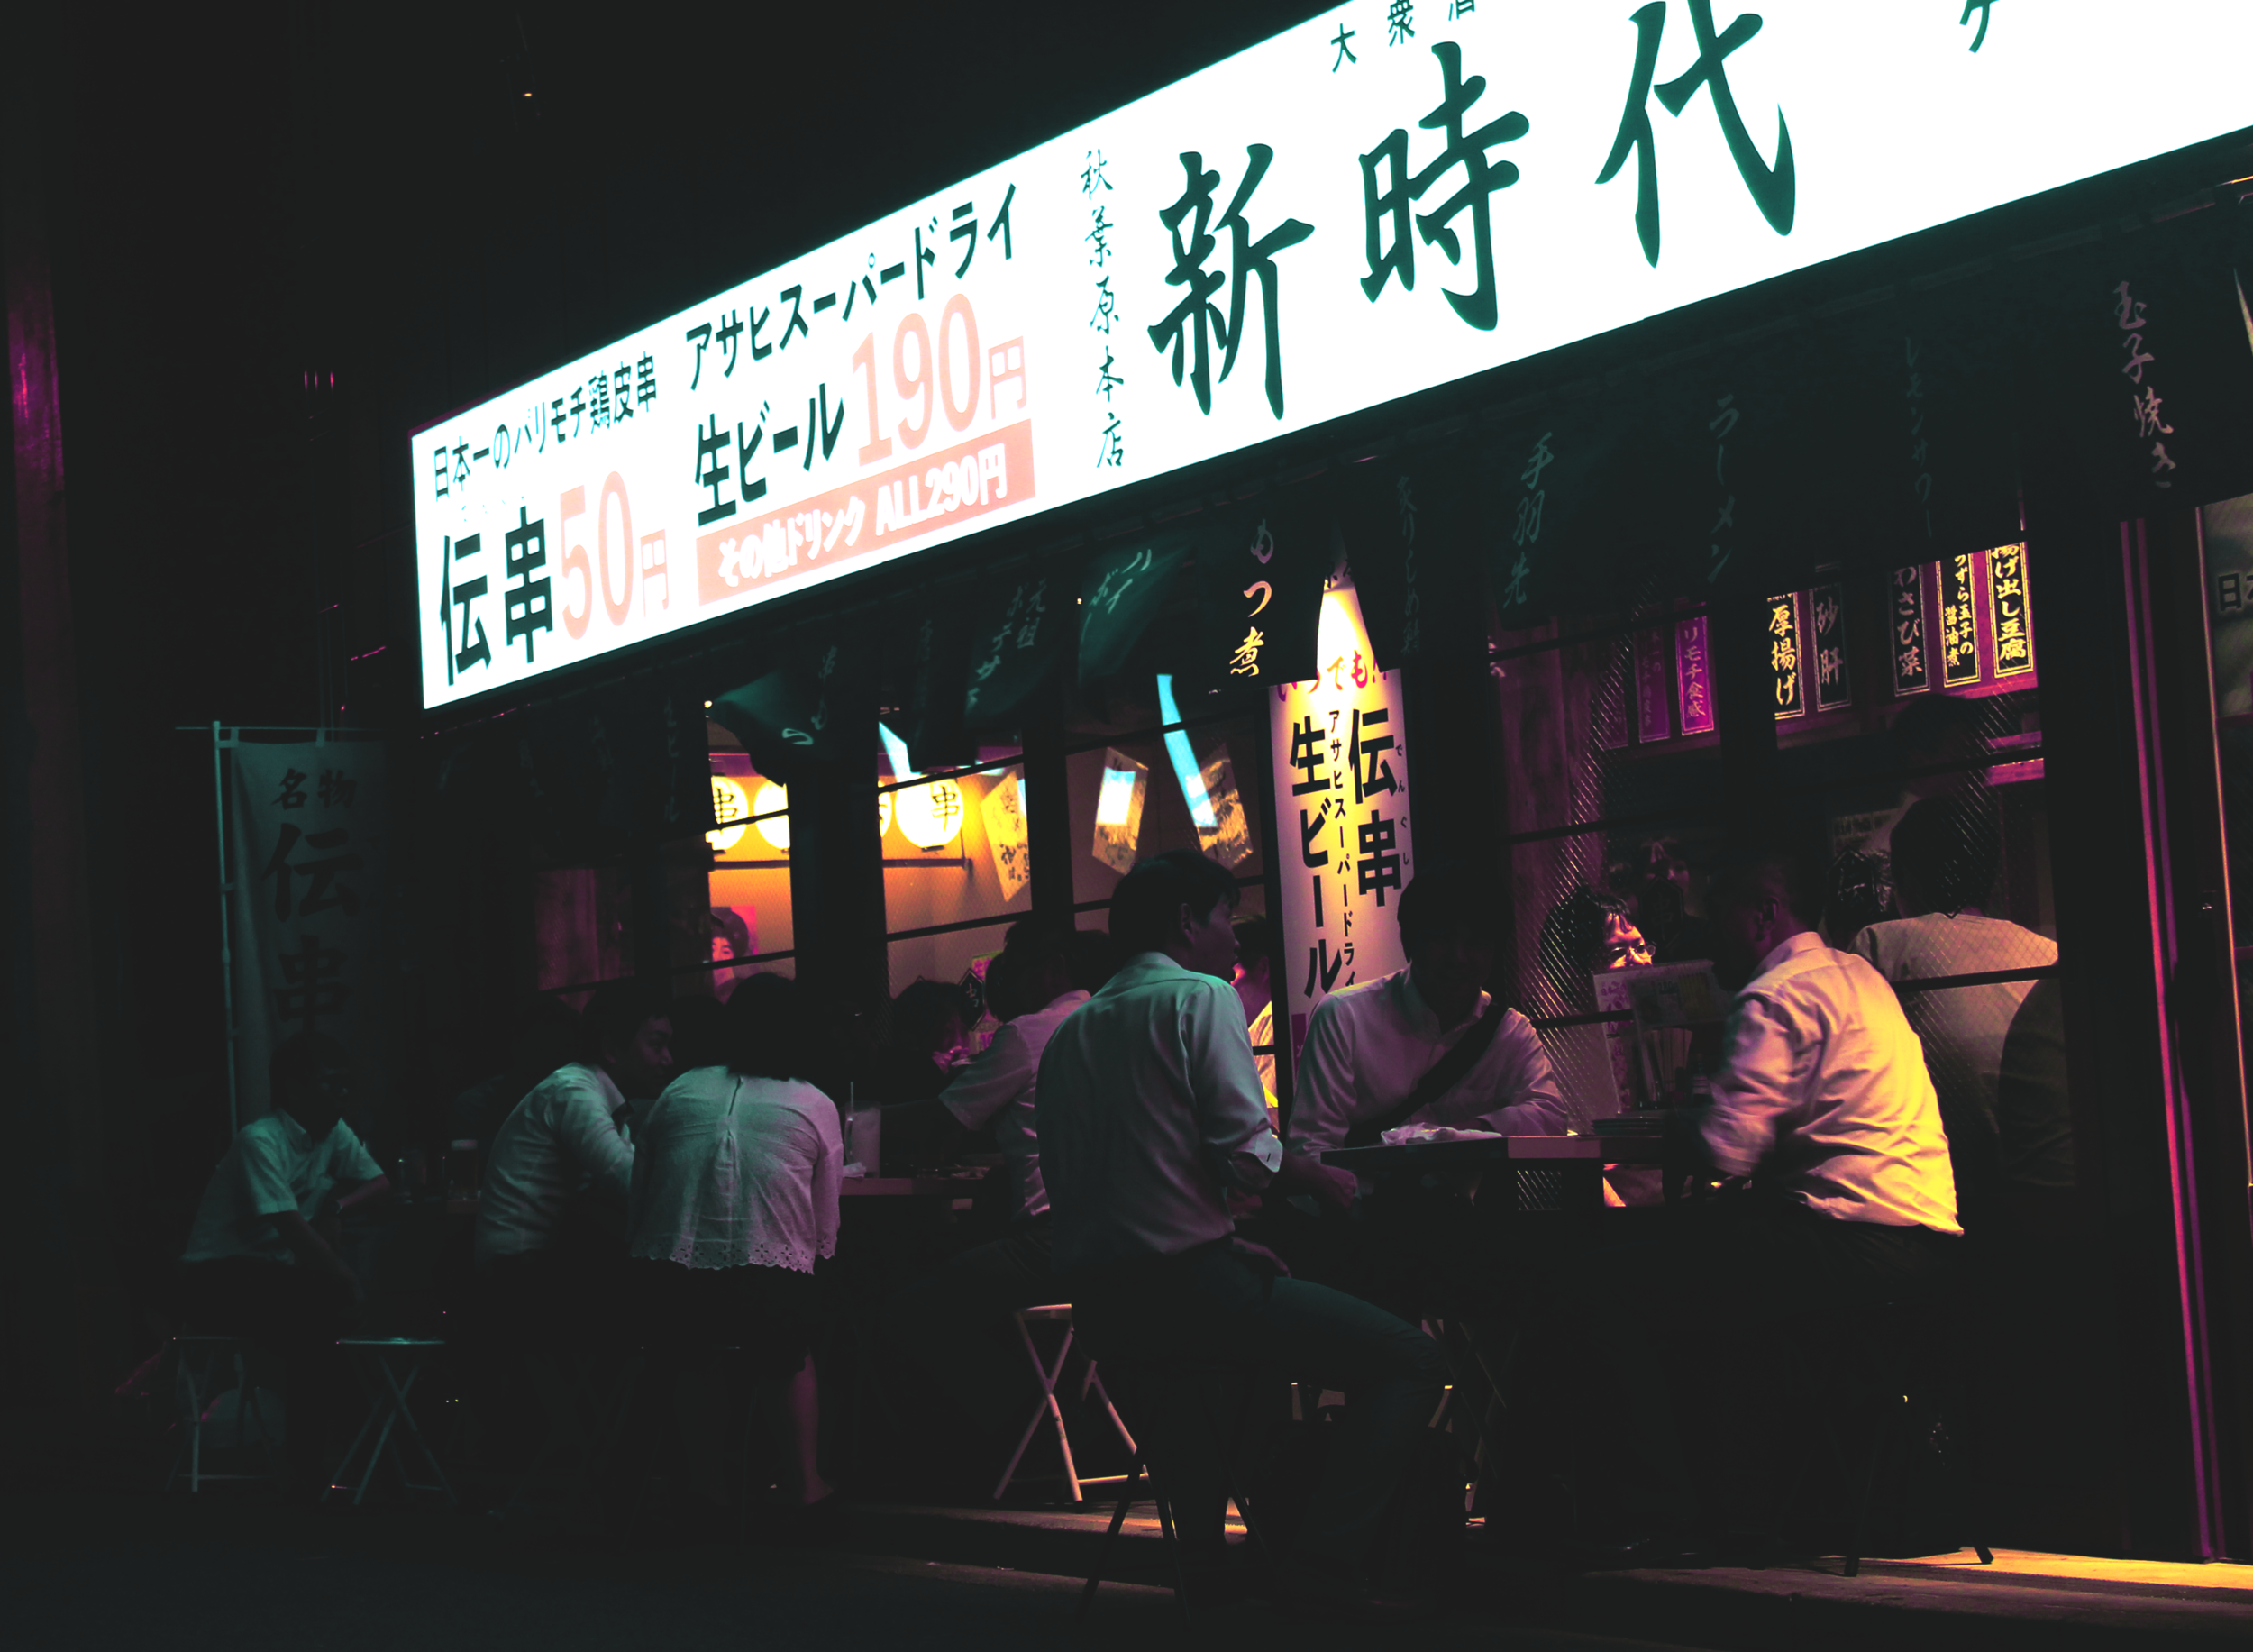 akihabarastreet2.png